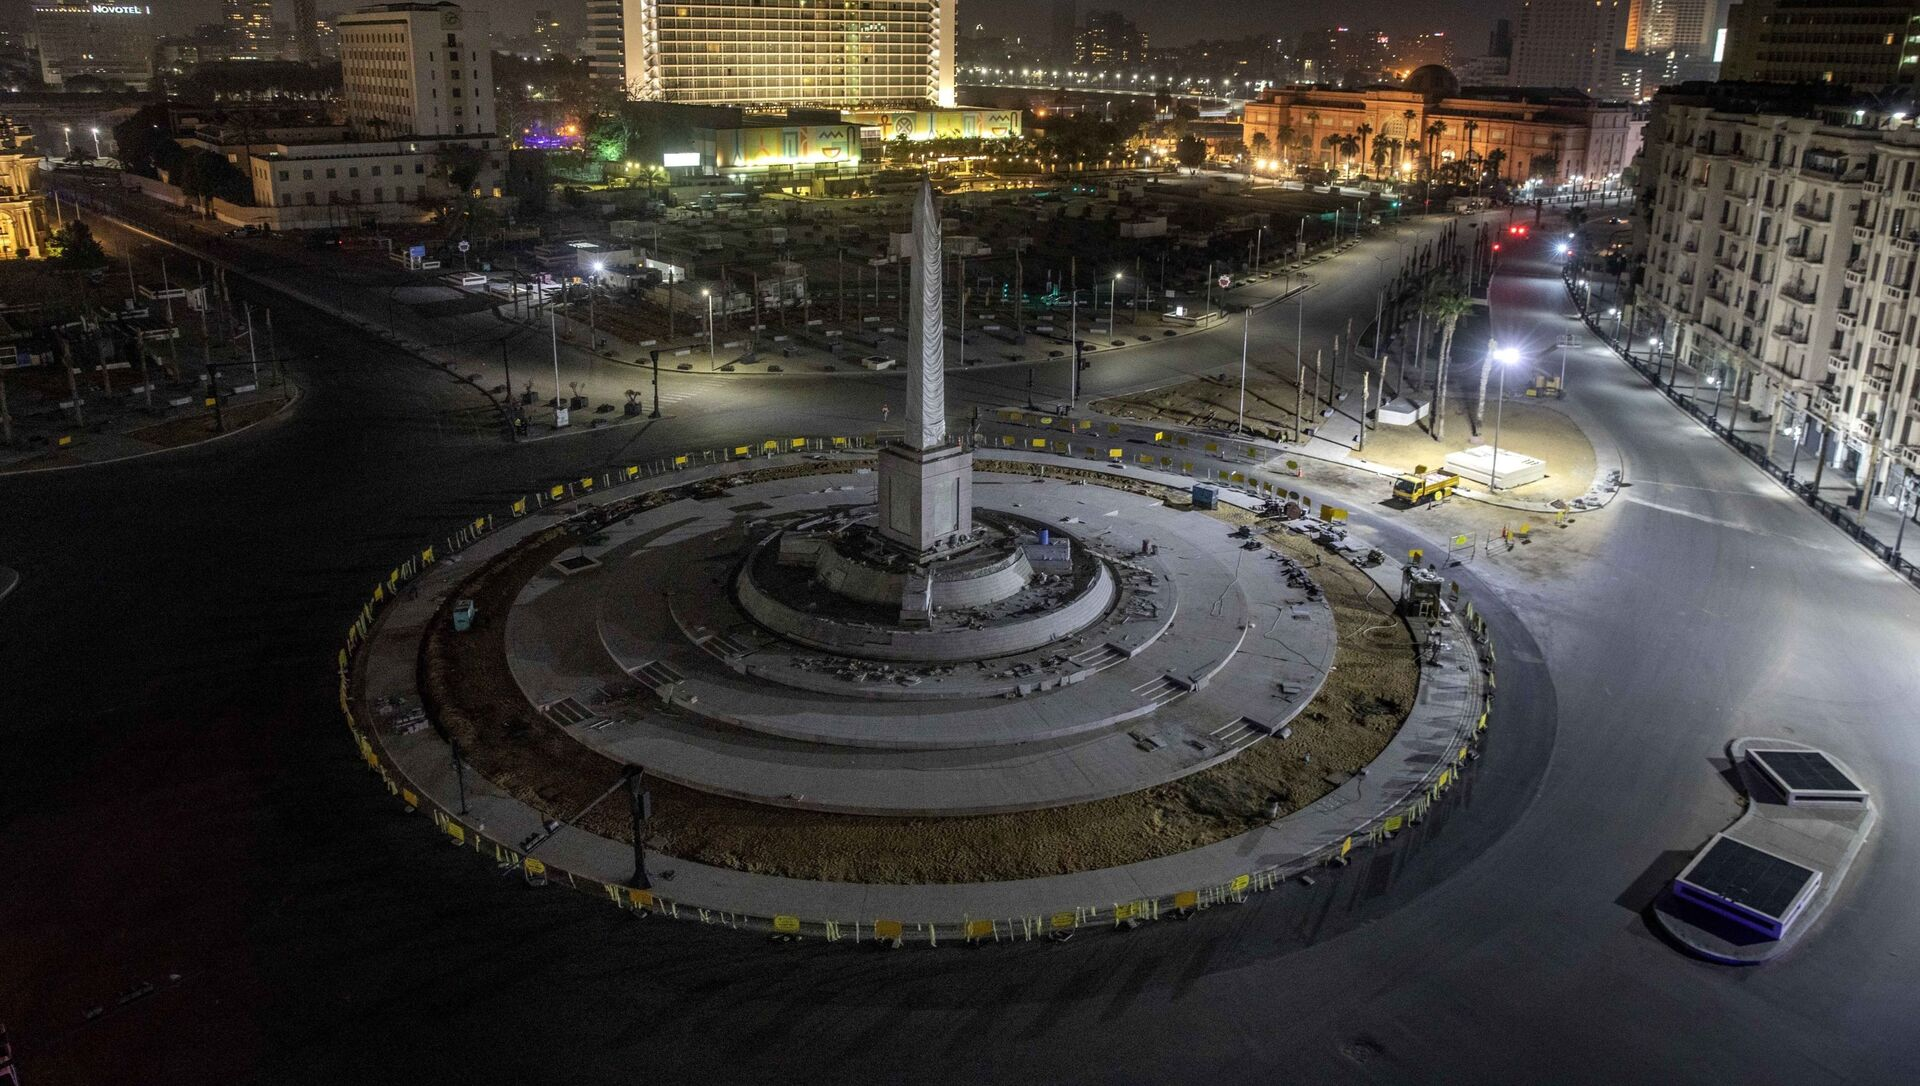 Policijski čas na Trgu tahrir u Egiptu - Sputnik Srbija, 1920, 09.03.2021